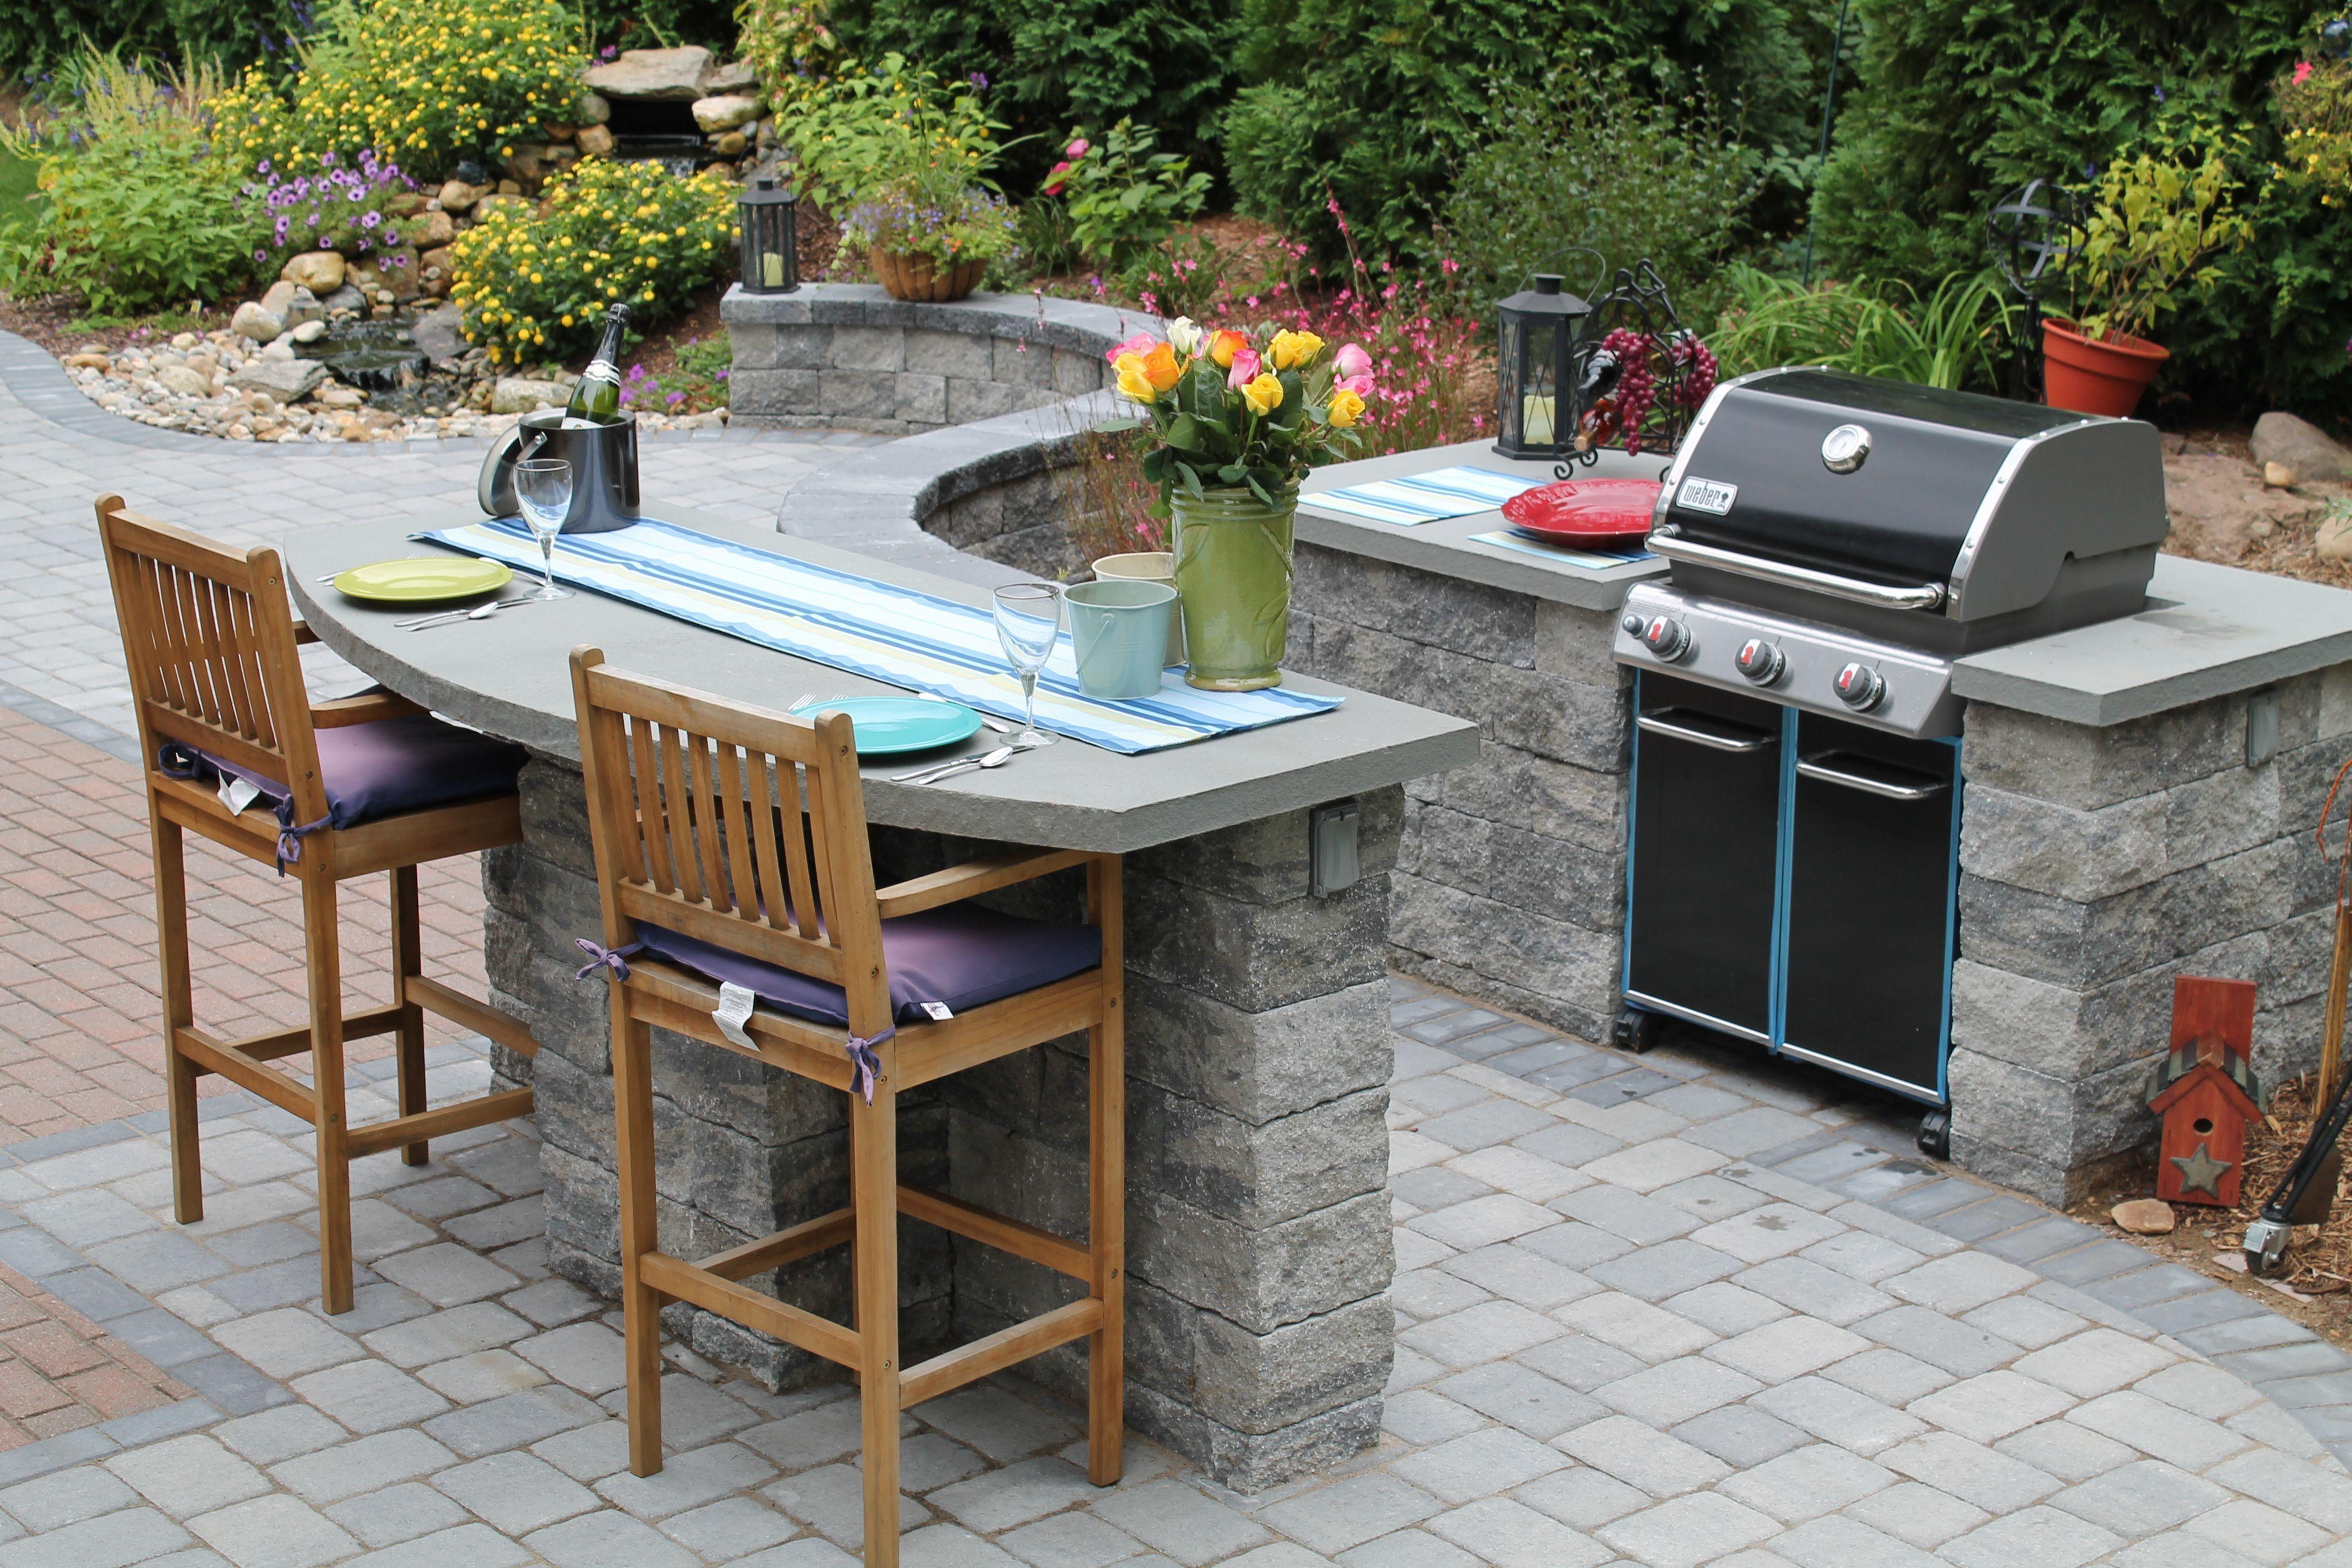 10 Astonishing Outdoor Kitchen Design Ideas For Best Inspirations Outdoor Kitchen Design Outdoor Barbeque Outdoor Kitchen